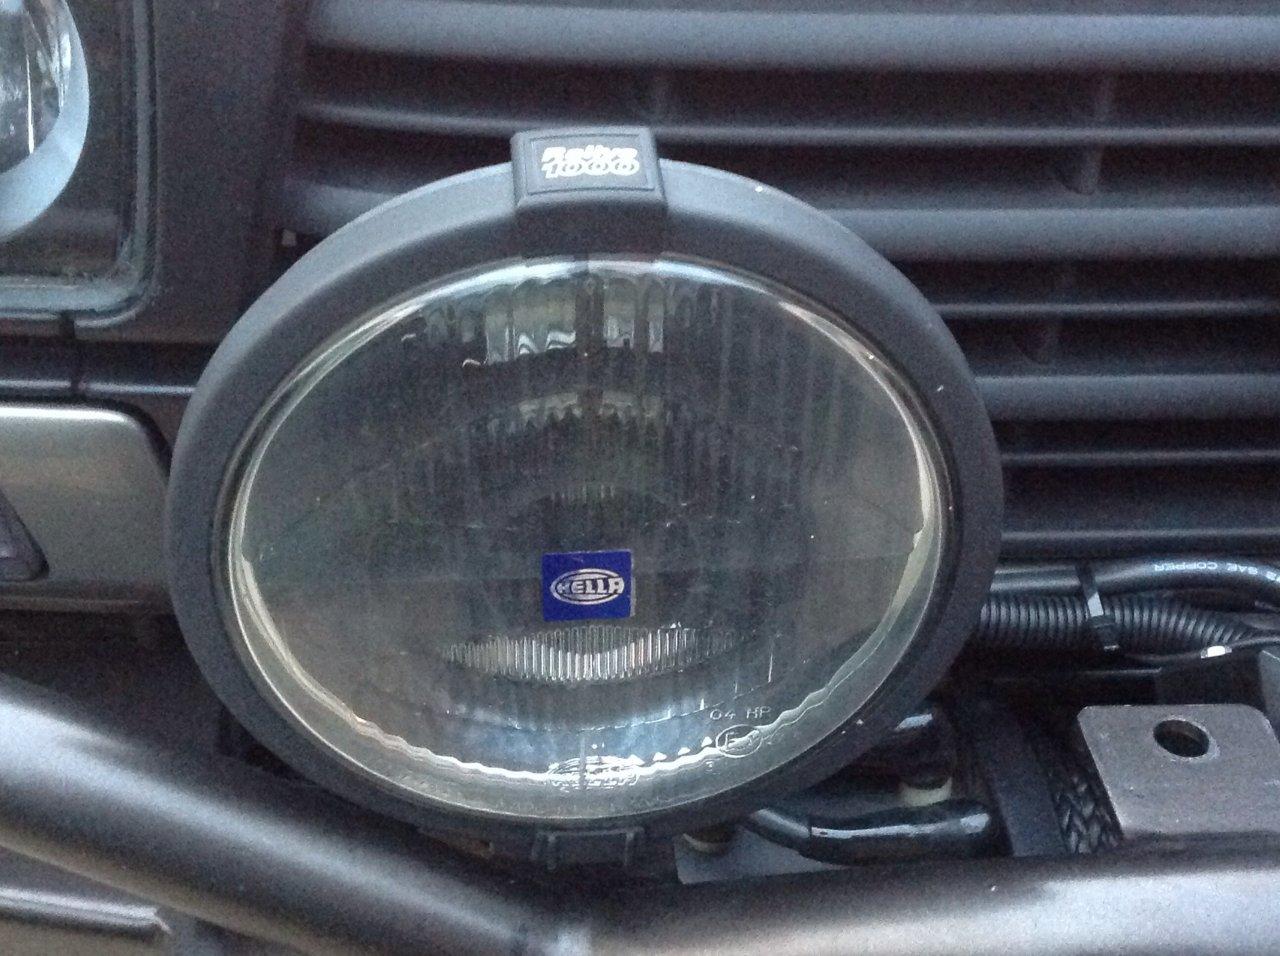 For Sale Houstonpair Of Hella 1000 Black Magic Lights W Wiring Harness Toyota 4runner